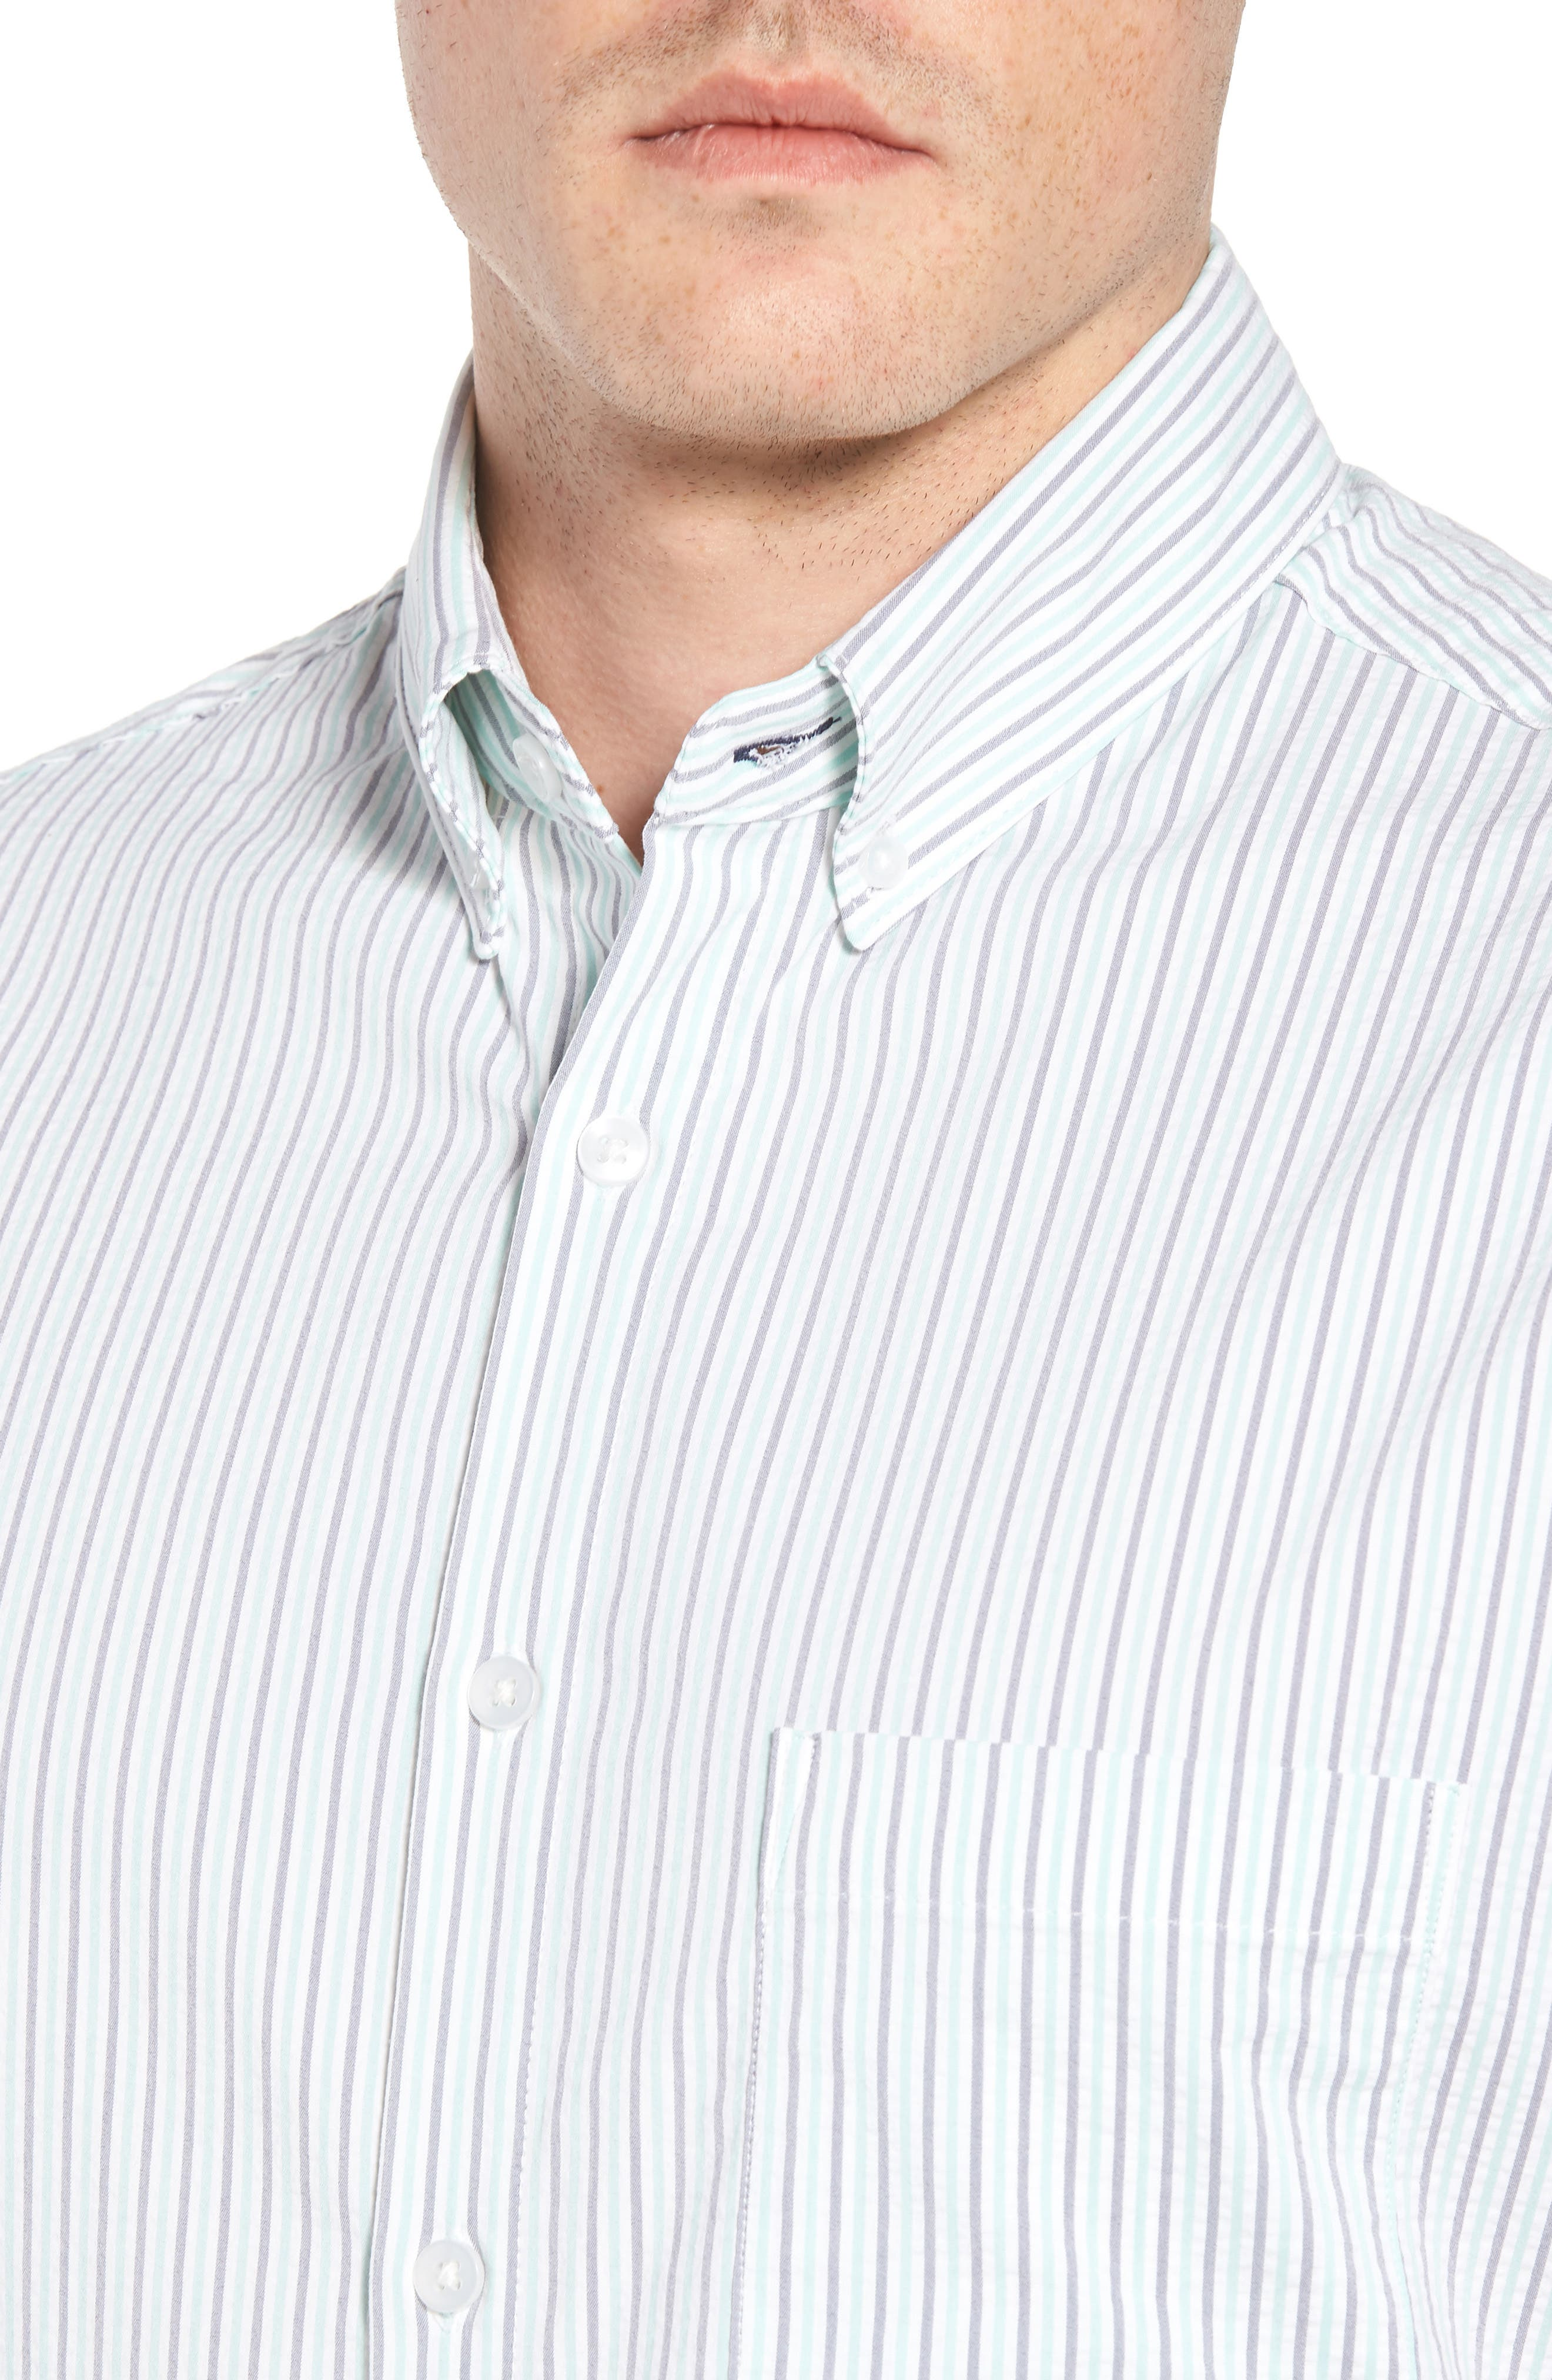 Eastland Short Sleeve Sport Shirt,                             Alternate thumbnail 2, color,                             Green